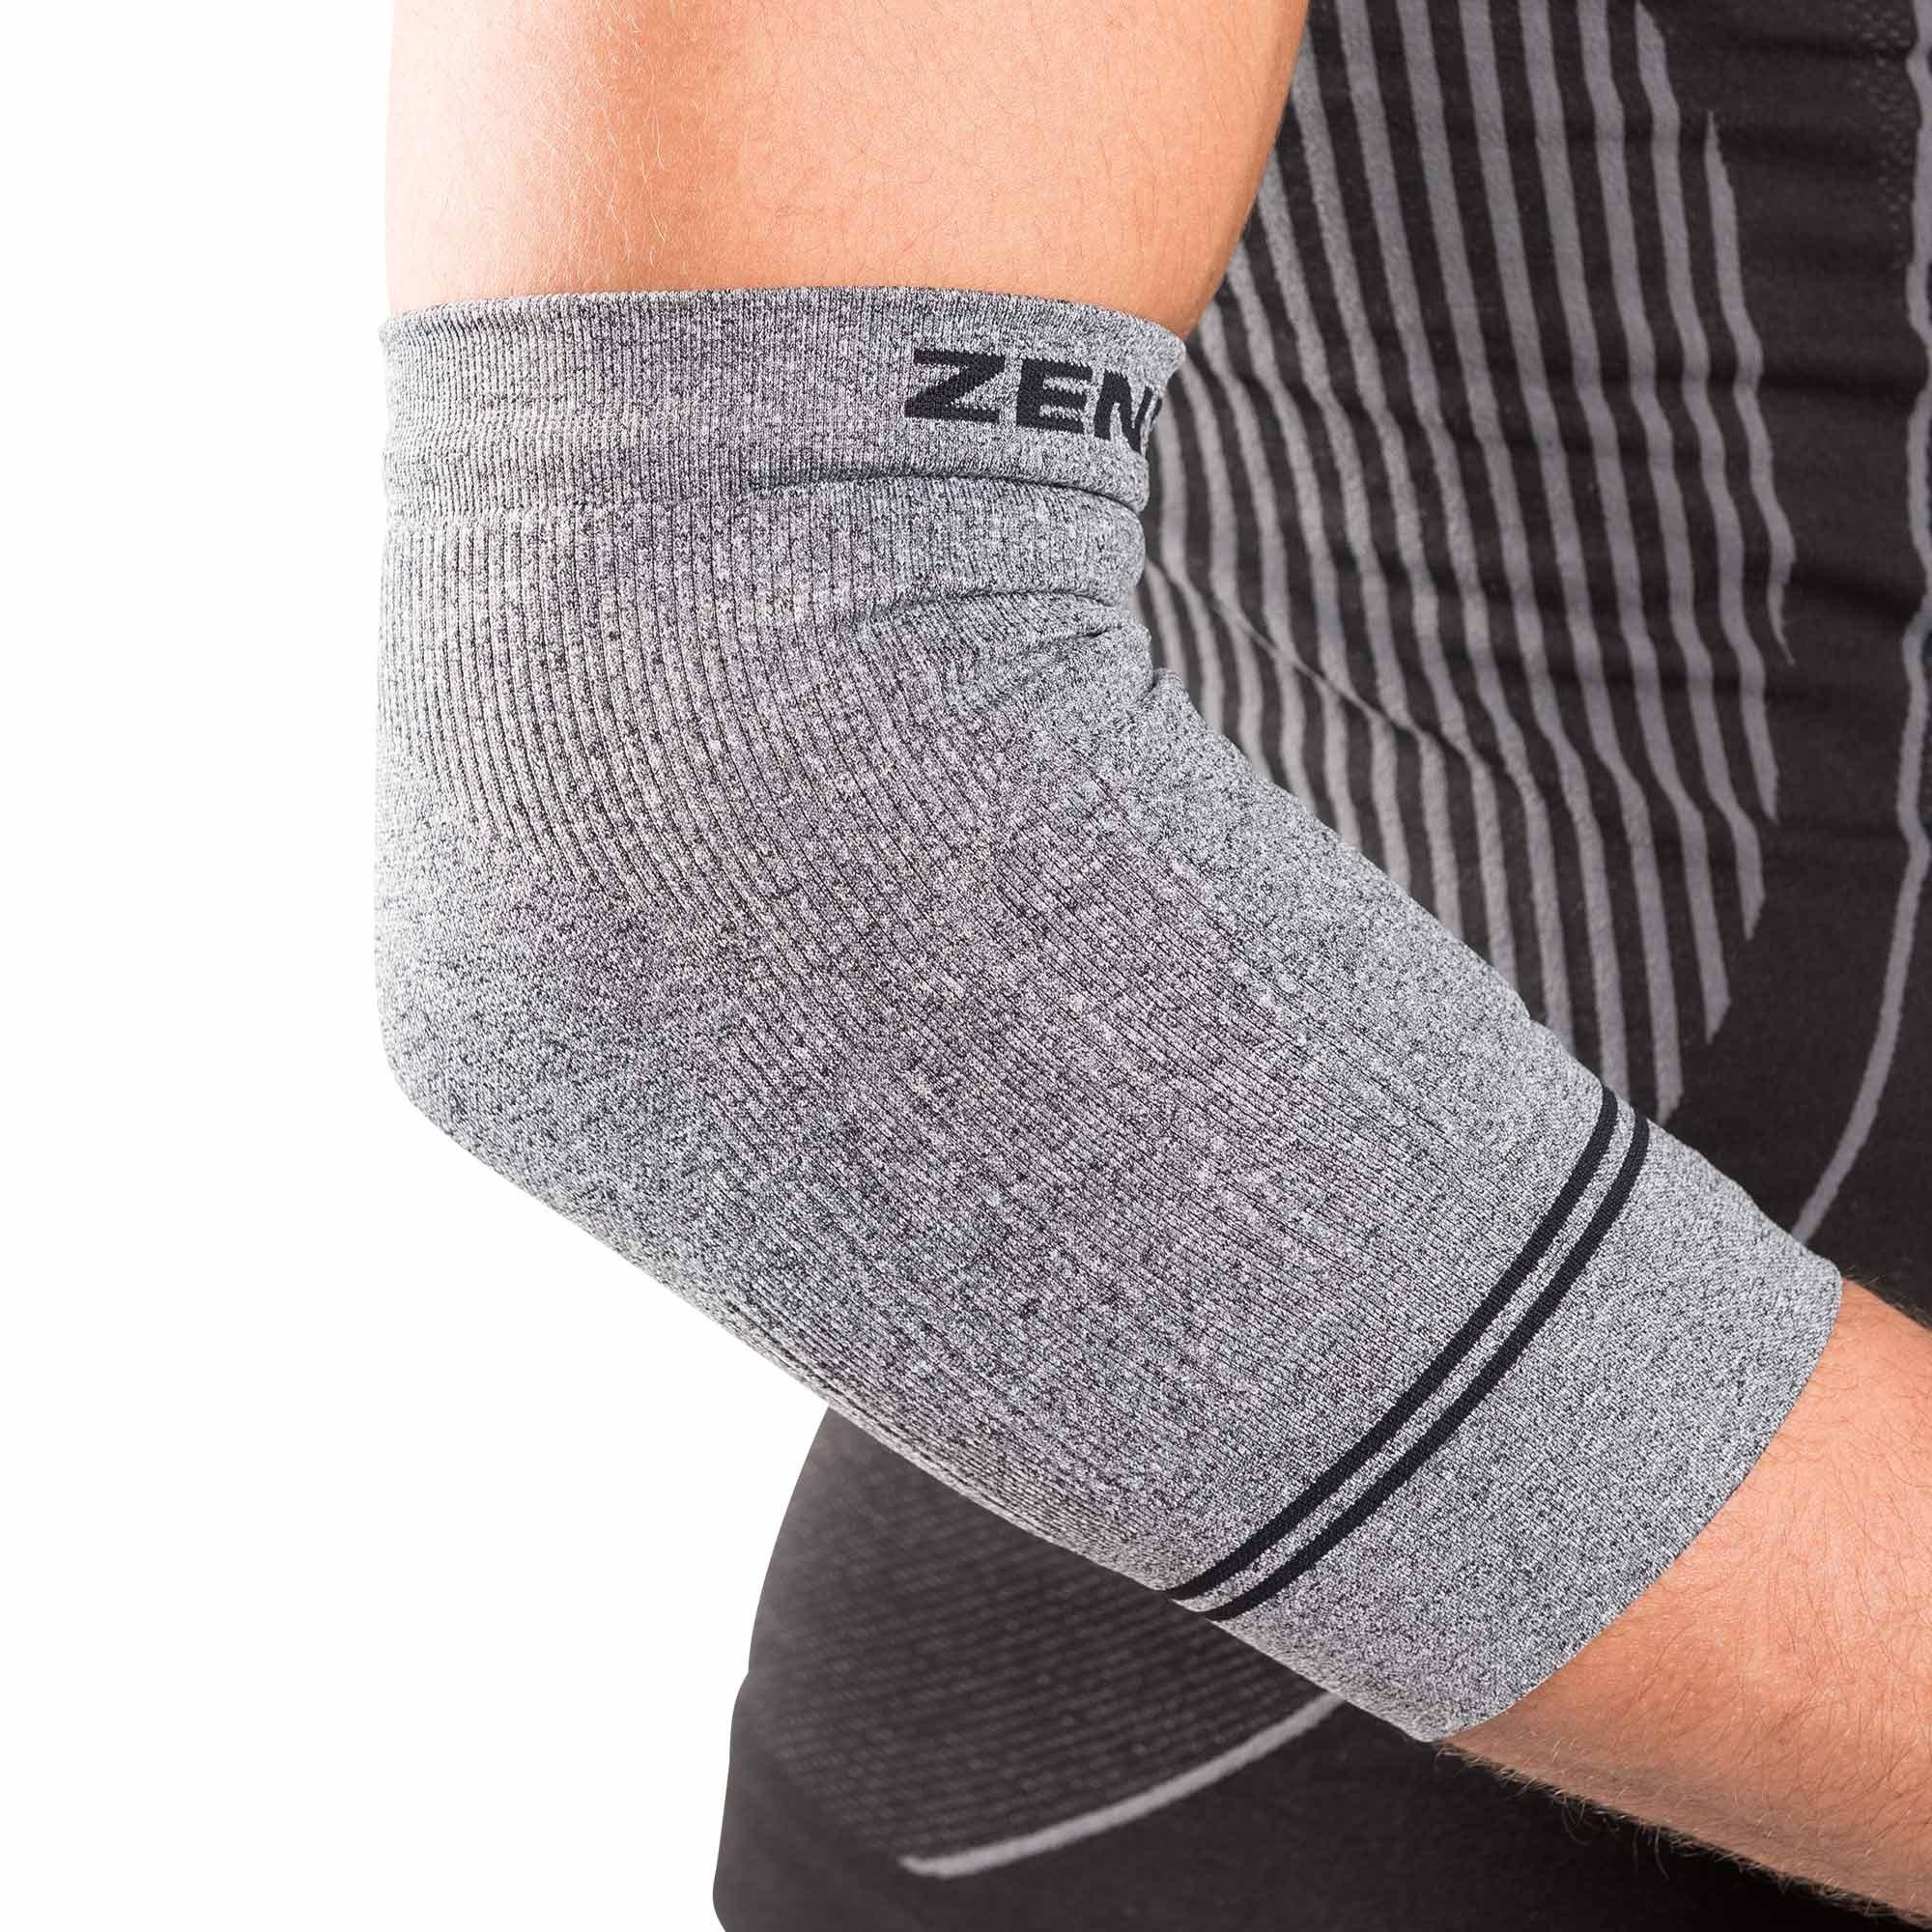 Zensah Compression Tennis Elbow Sleeve, Elbow Brace,Heather Grey, Small by Zensah